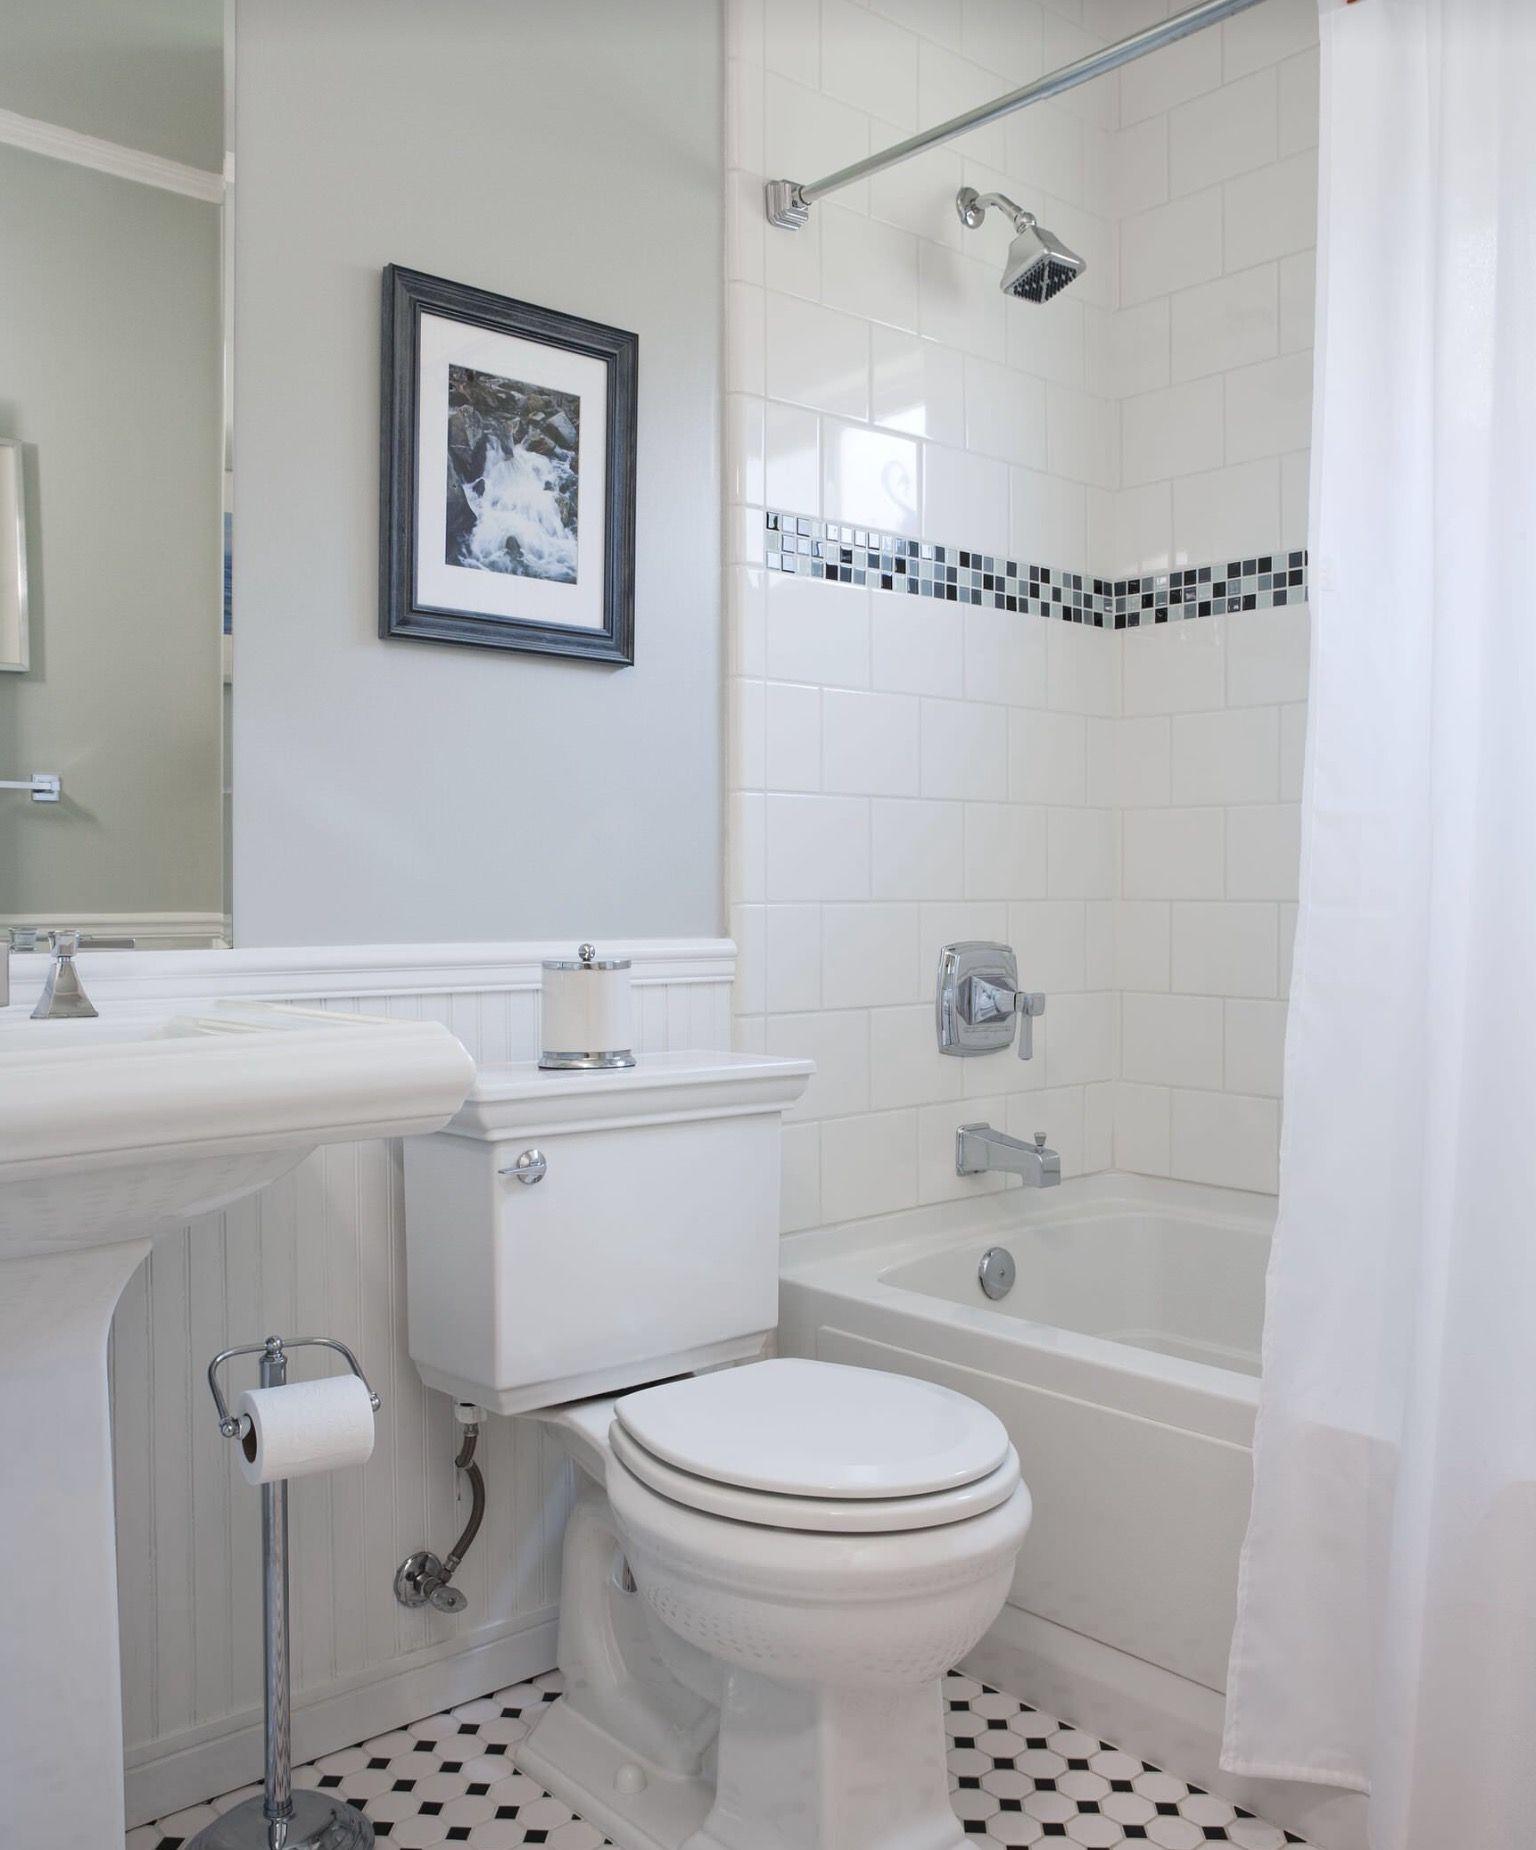 Pin By Marz On Bathrooms Bathroom Tile Designs White Bathroom Designs Traditional Bathroom